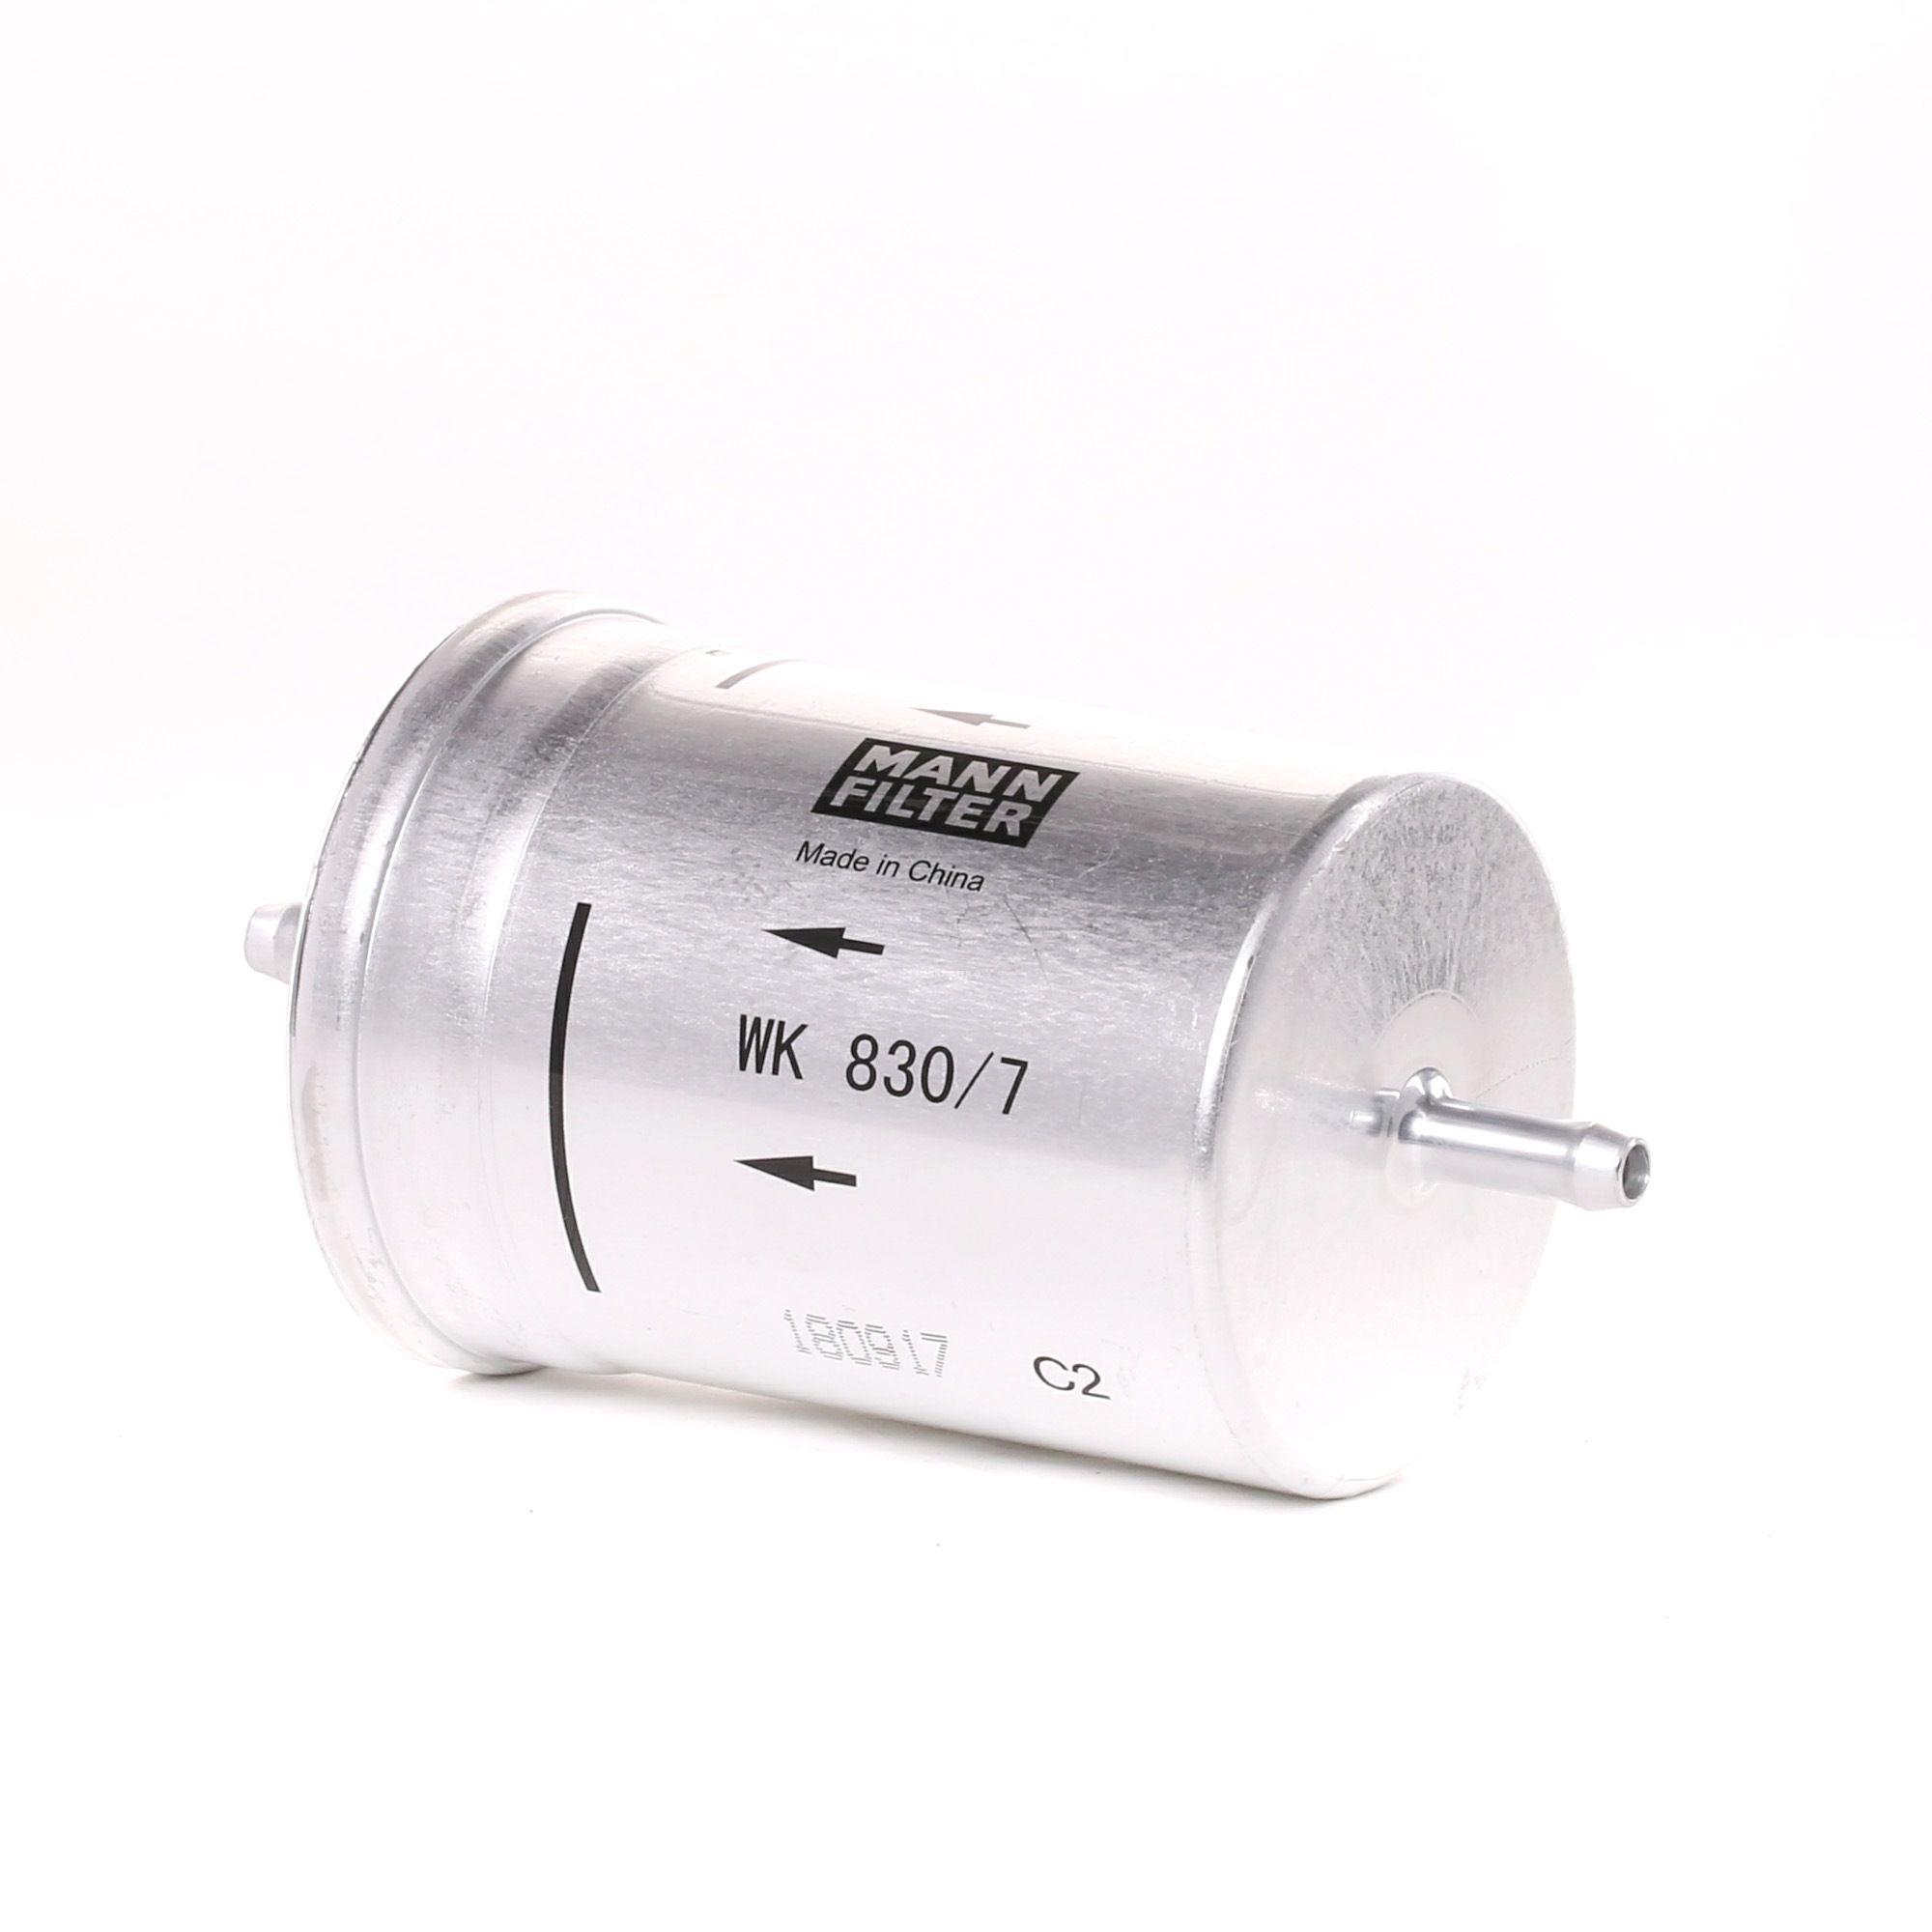 Fuel filter MANN-FILTER WK 830/7 rating